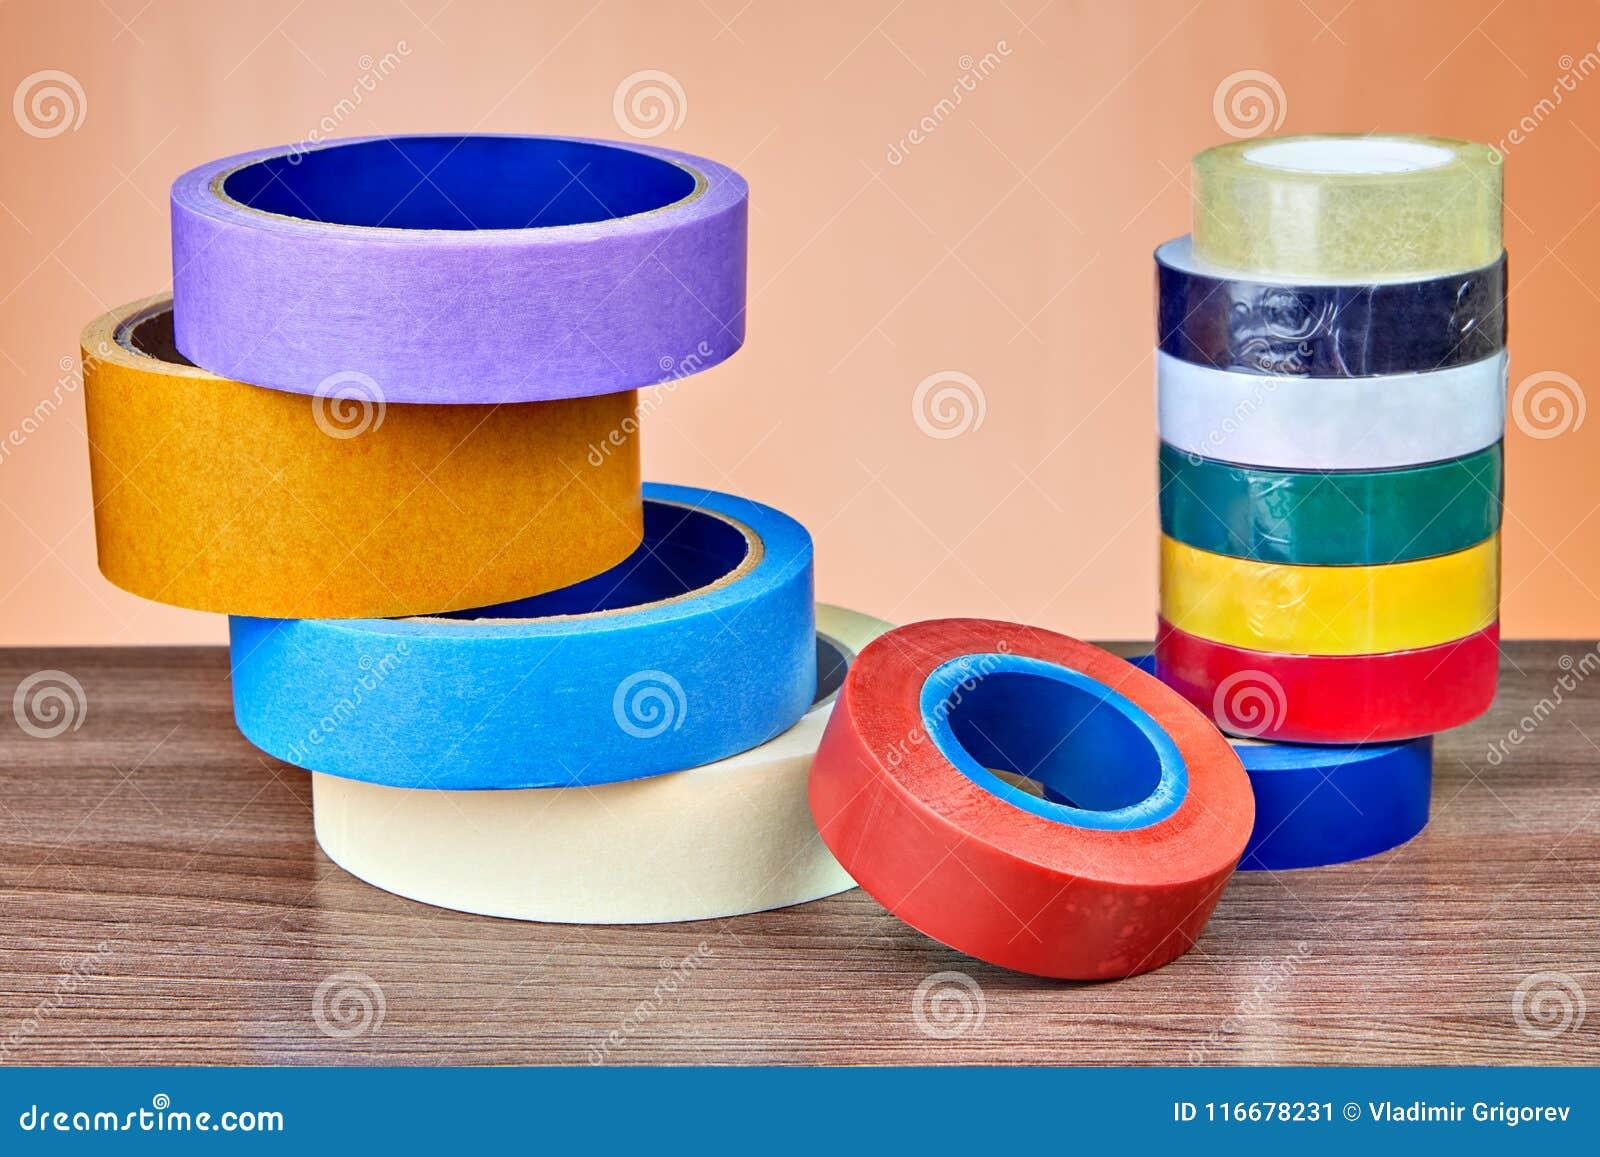 Duas pilhas de rolos da fita adesiva multi-colorida